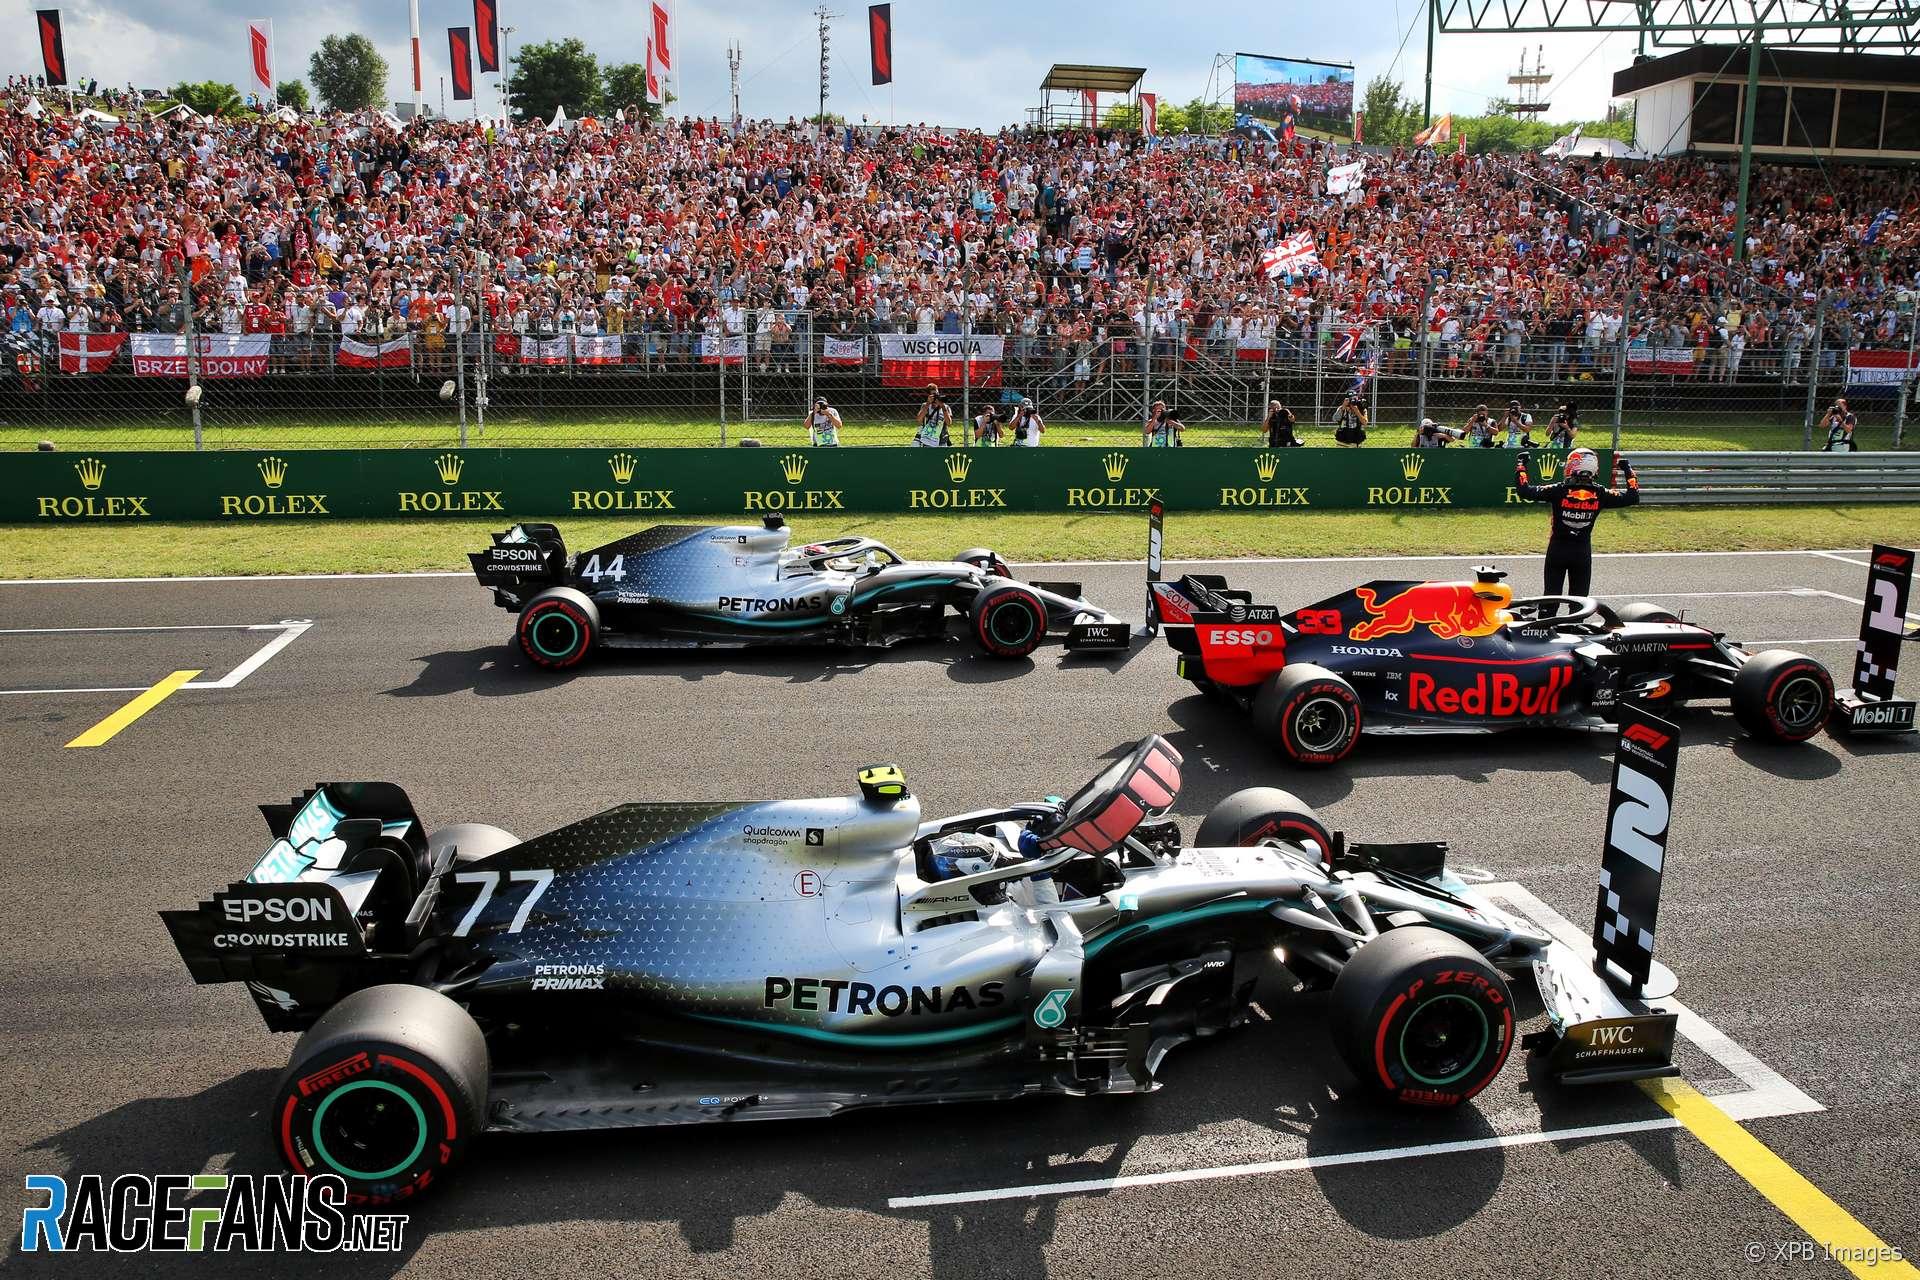 Max Verstappen, Lewis Hamilton, Valtteri Bottas, Hungaroring, 2019